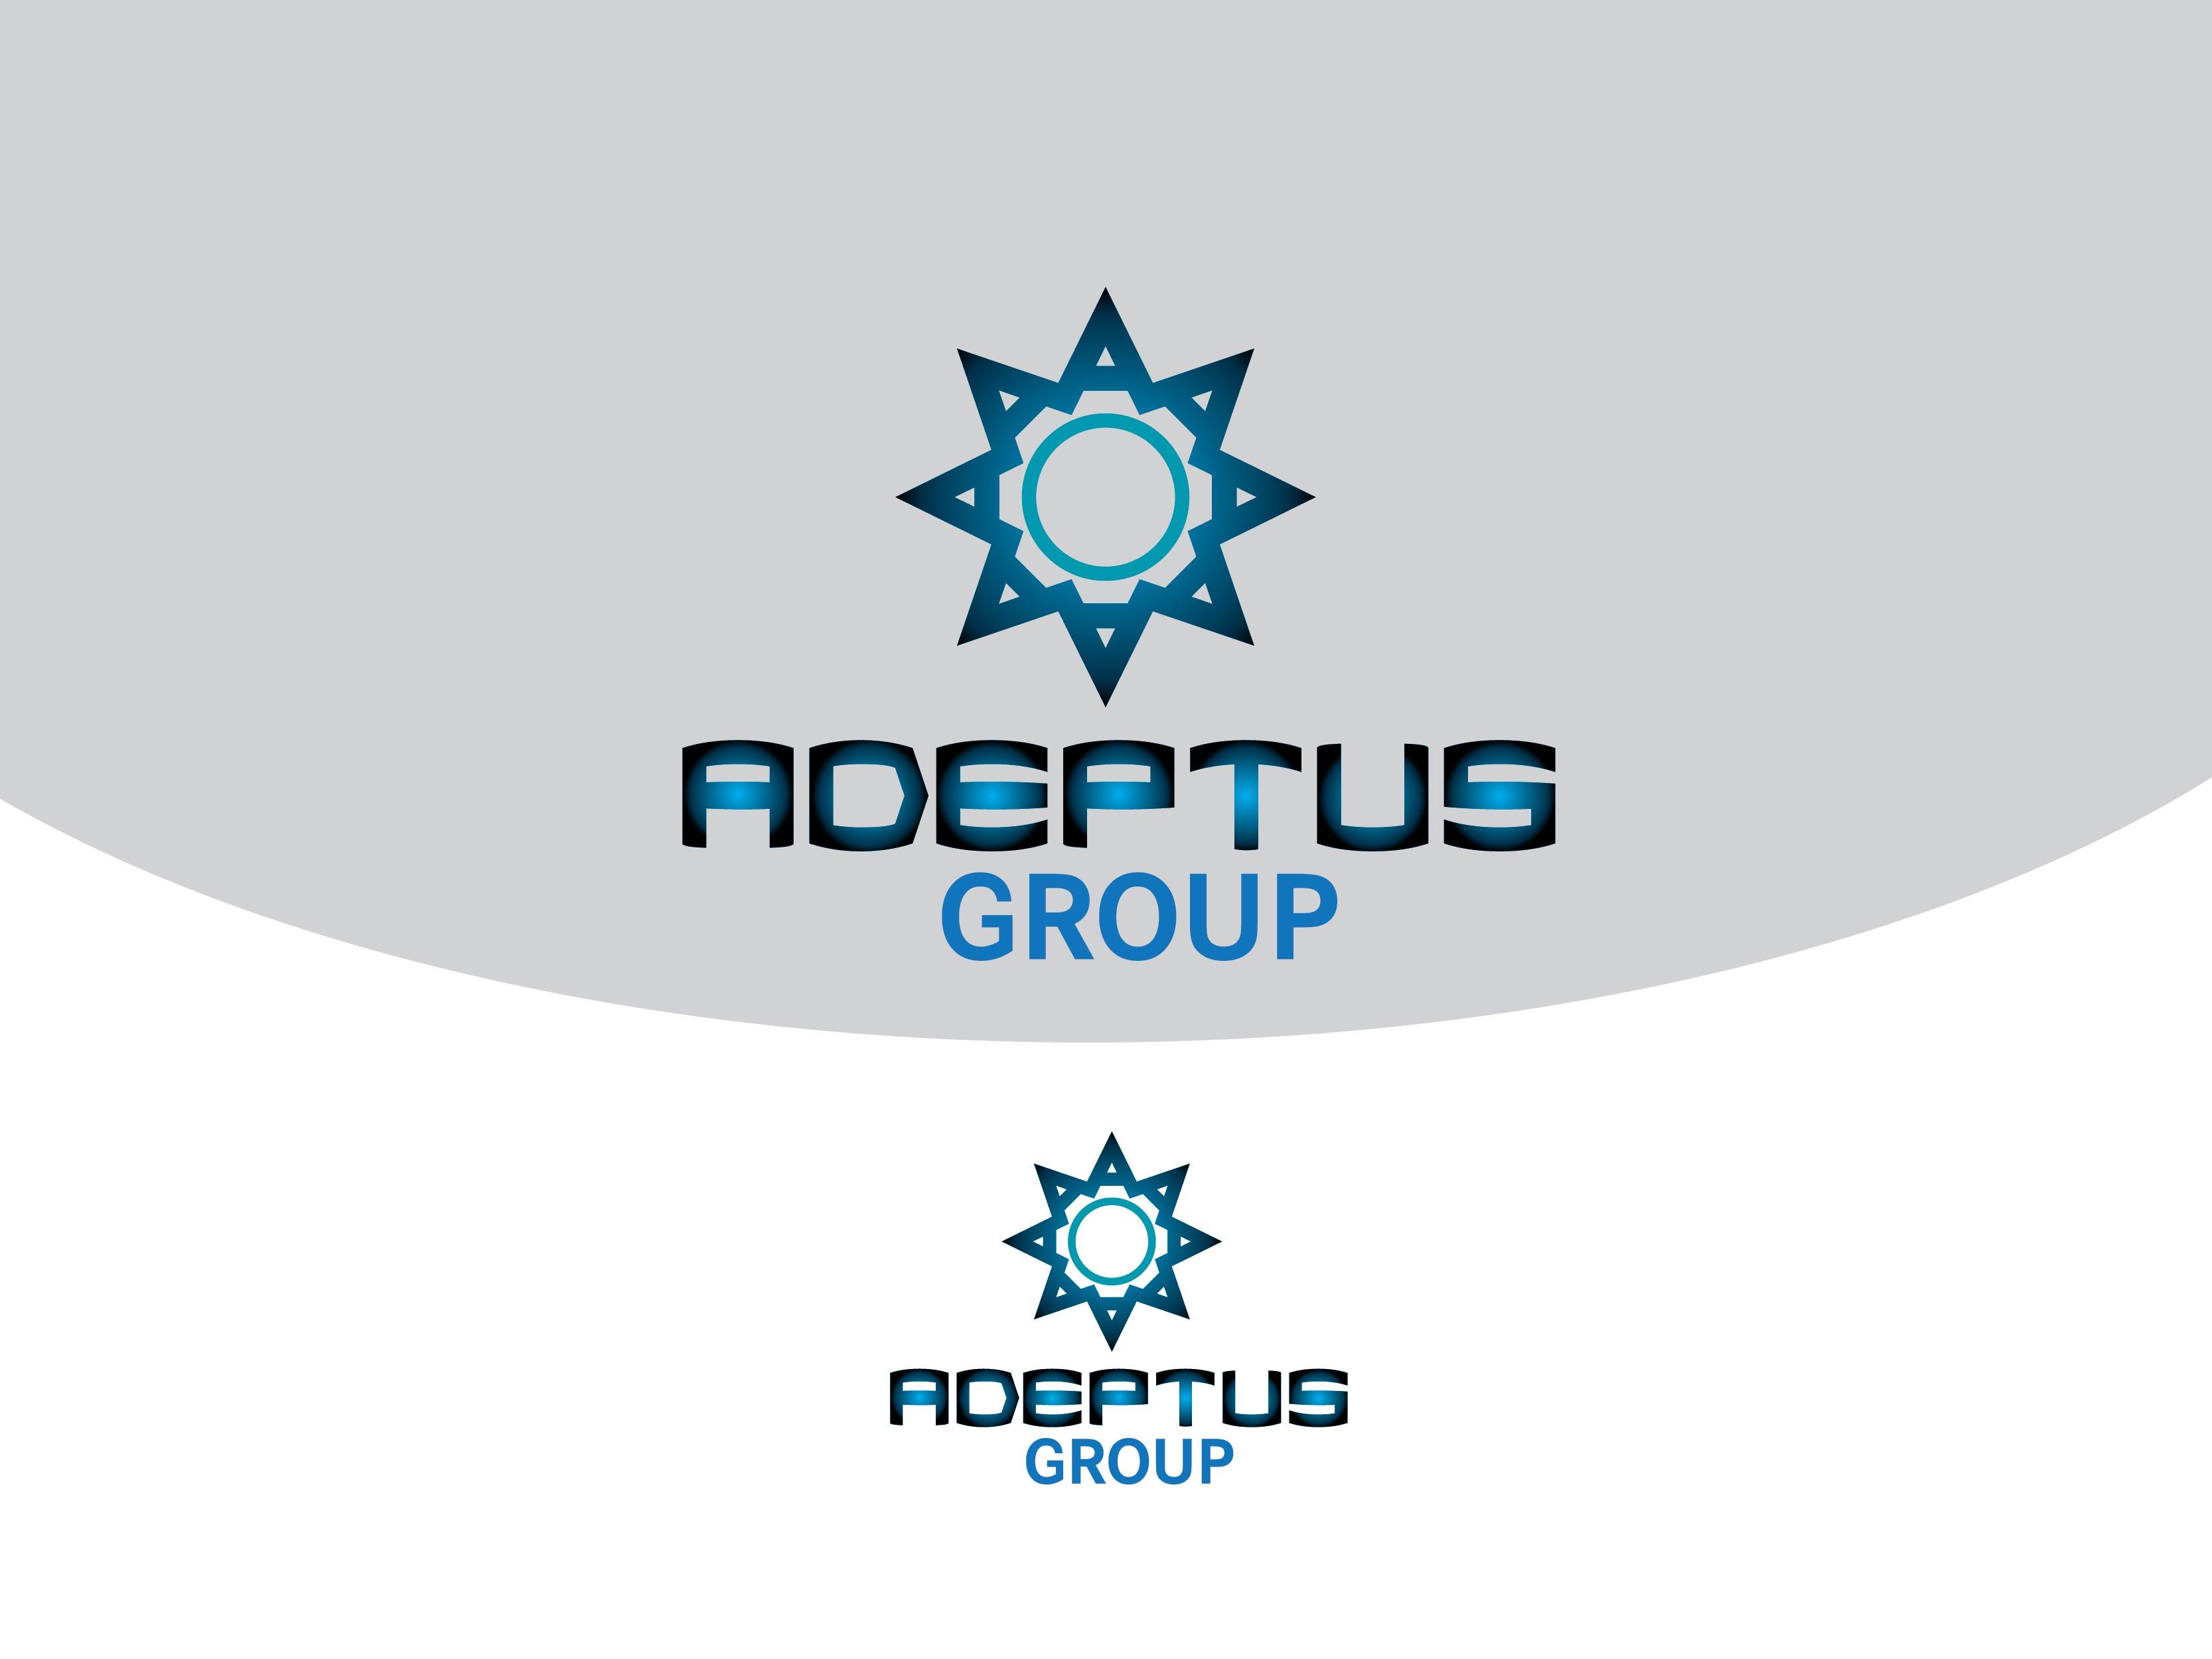 Logo Design by demang - Entry No. 73 in the Logo Design Contest New Logo Design for Adeptus Group.